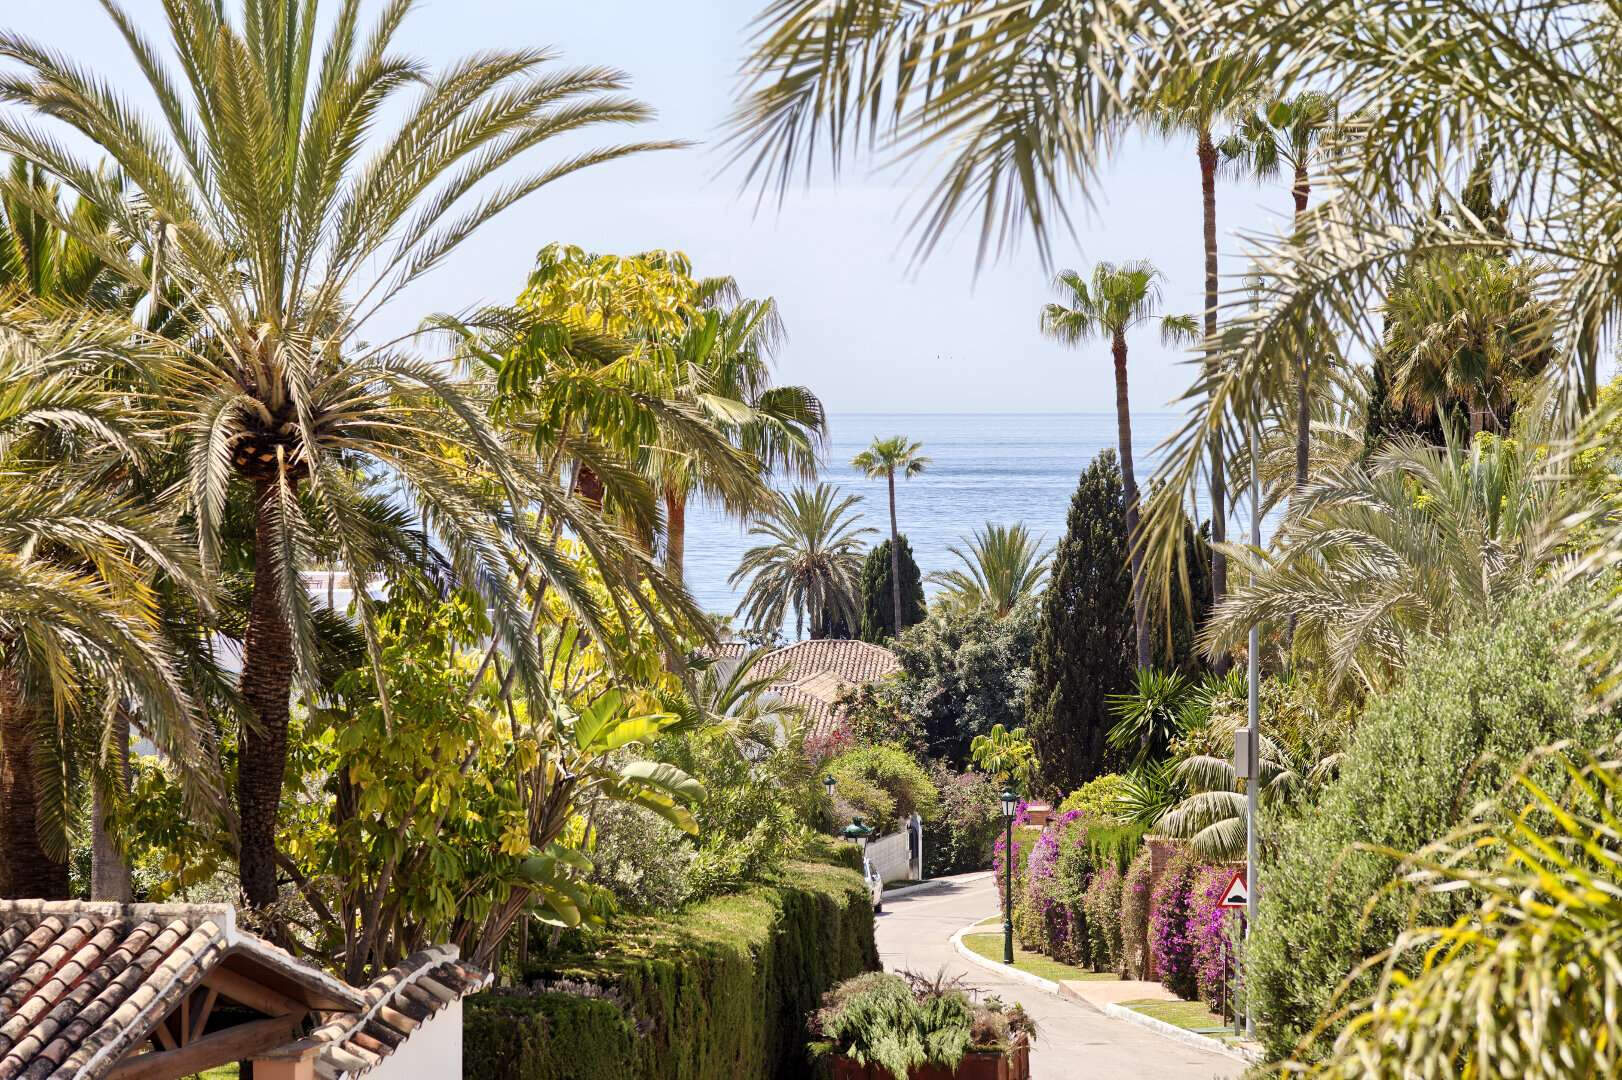 Villa for sale Los Monteros Playa Marbella walking distance to the beach and La Cabane Beach Club